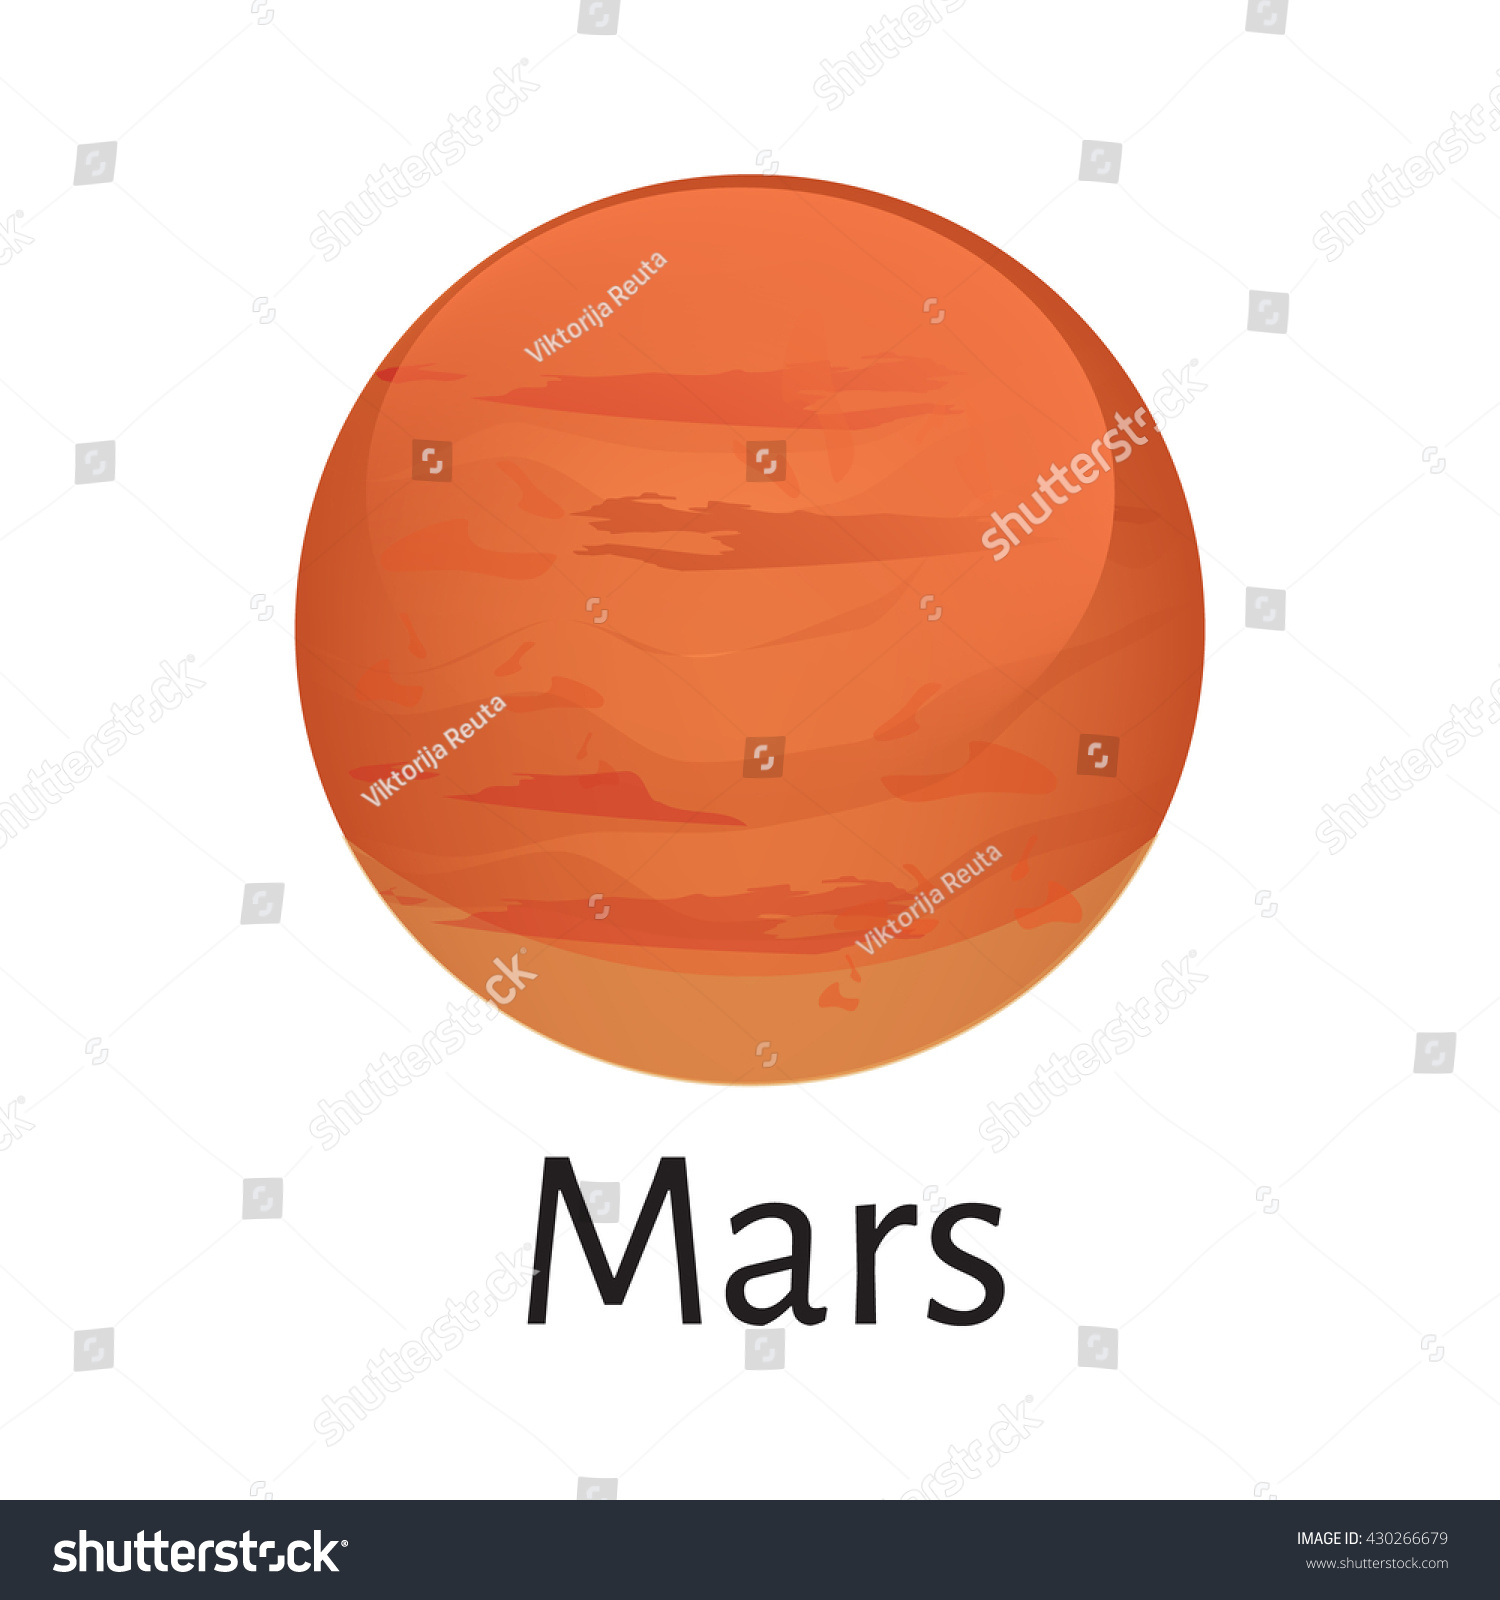 mars planet vector - photo #8